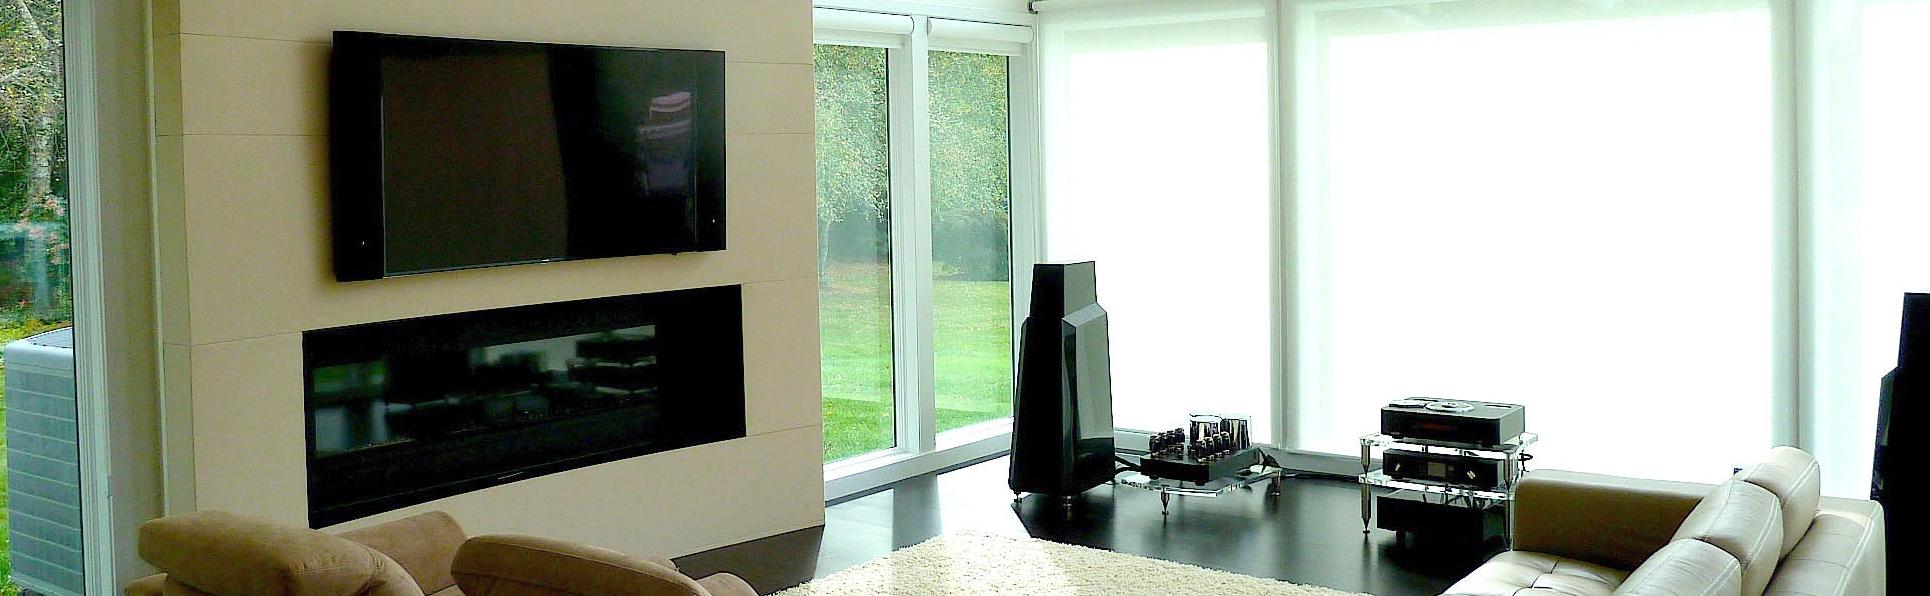 smart home automation long island nyc